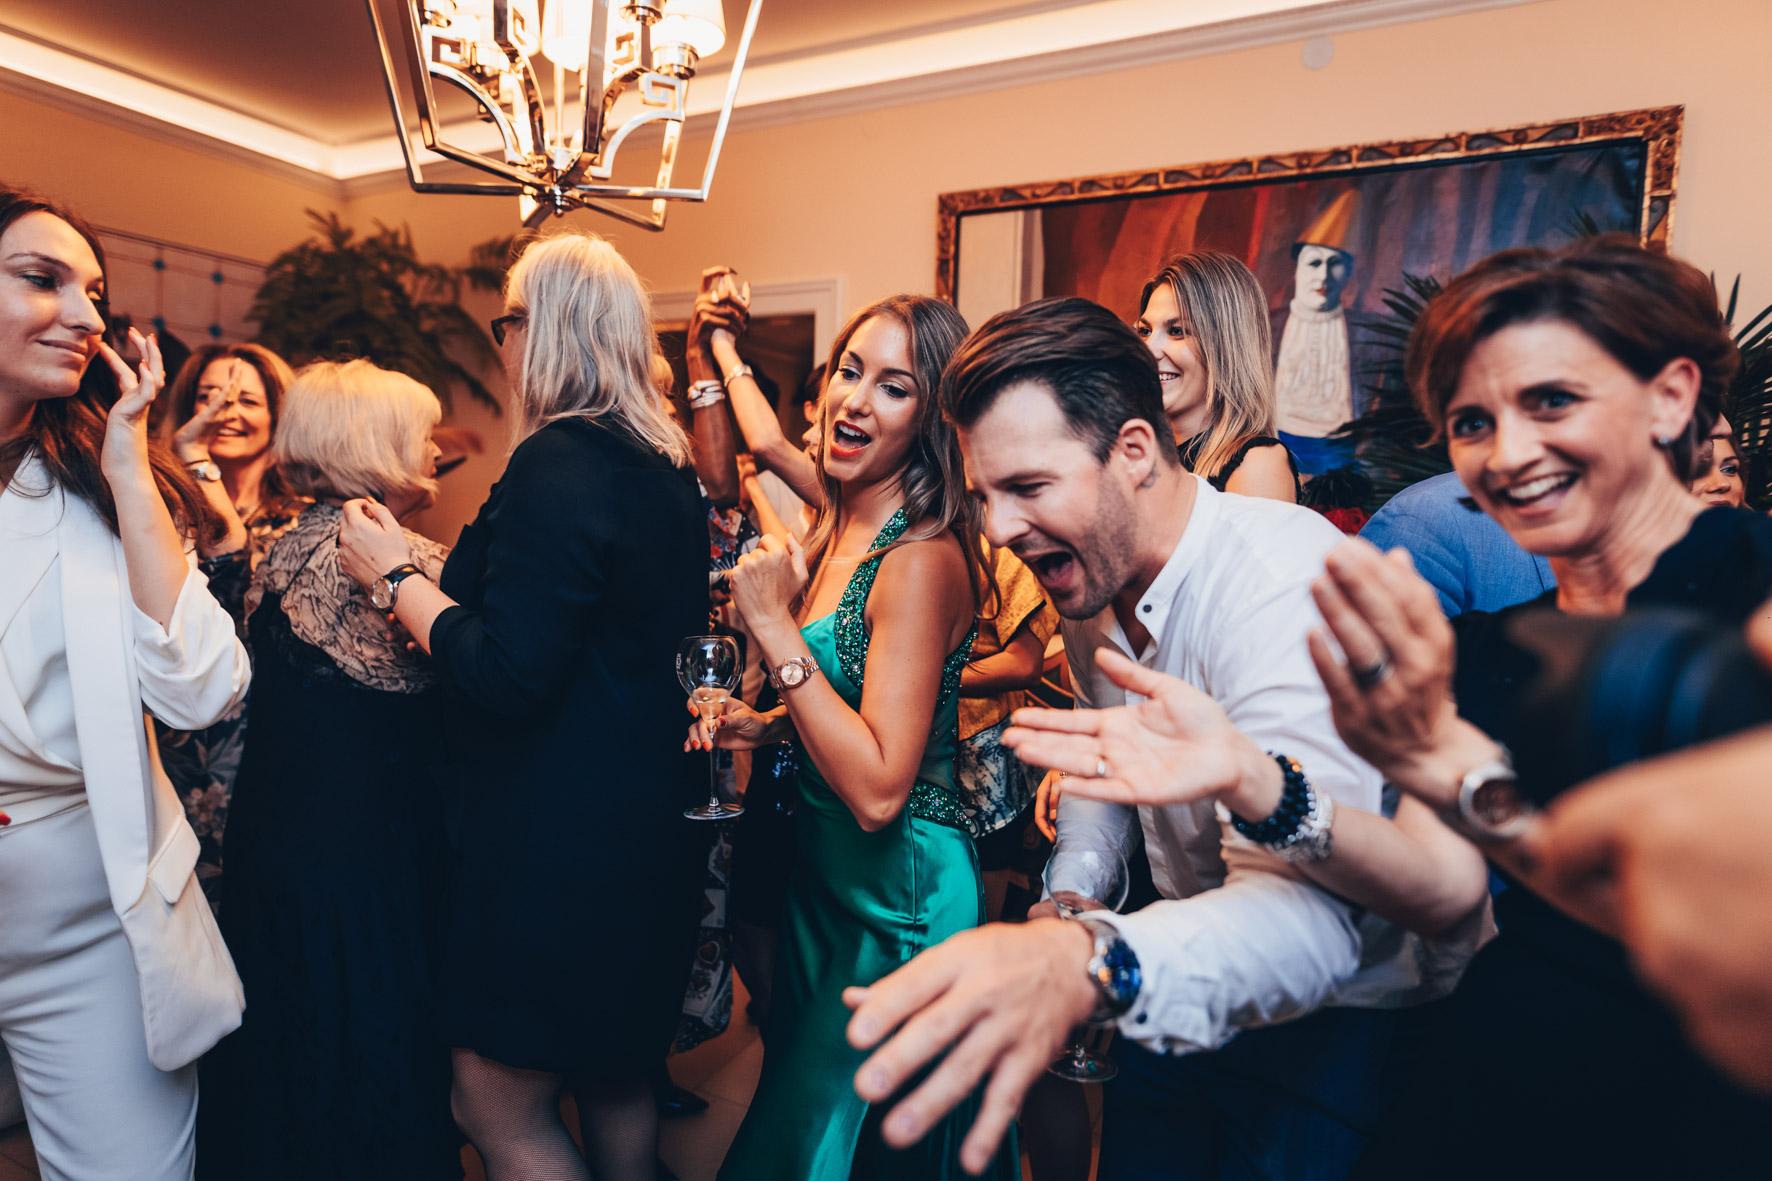 Konrad-lifestyle-art-basel-%22grand-party%22-2019-90.jpg